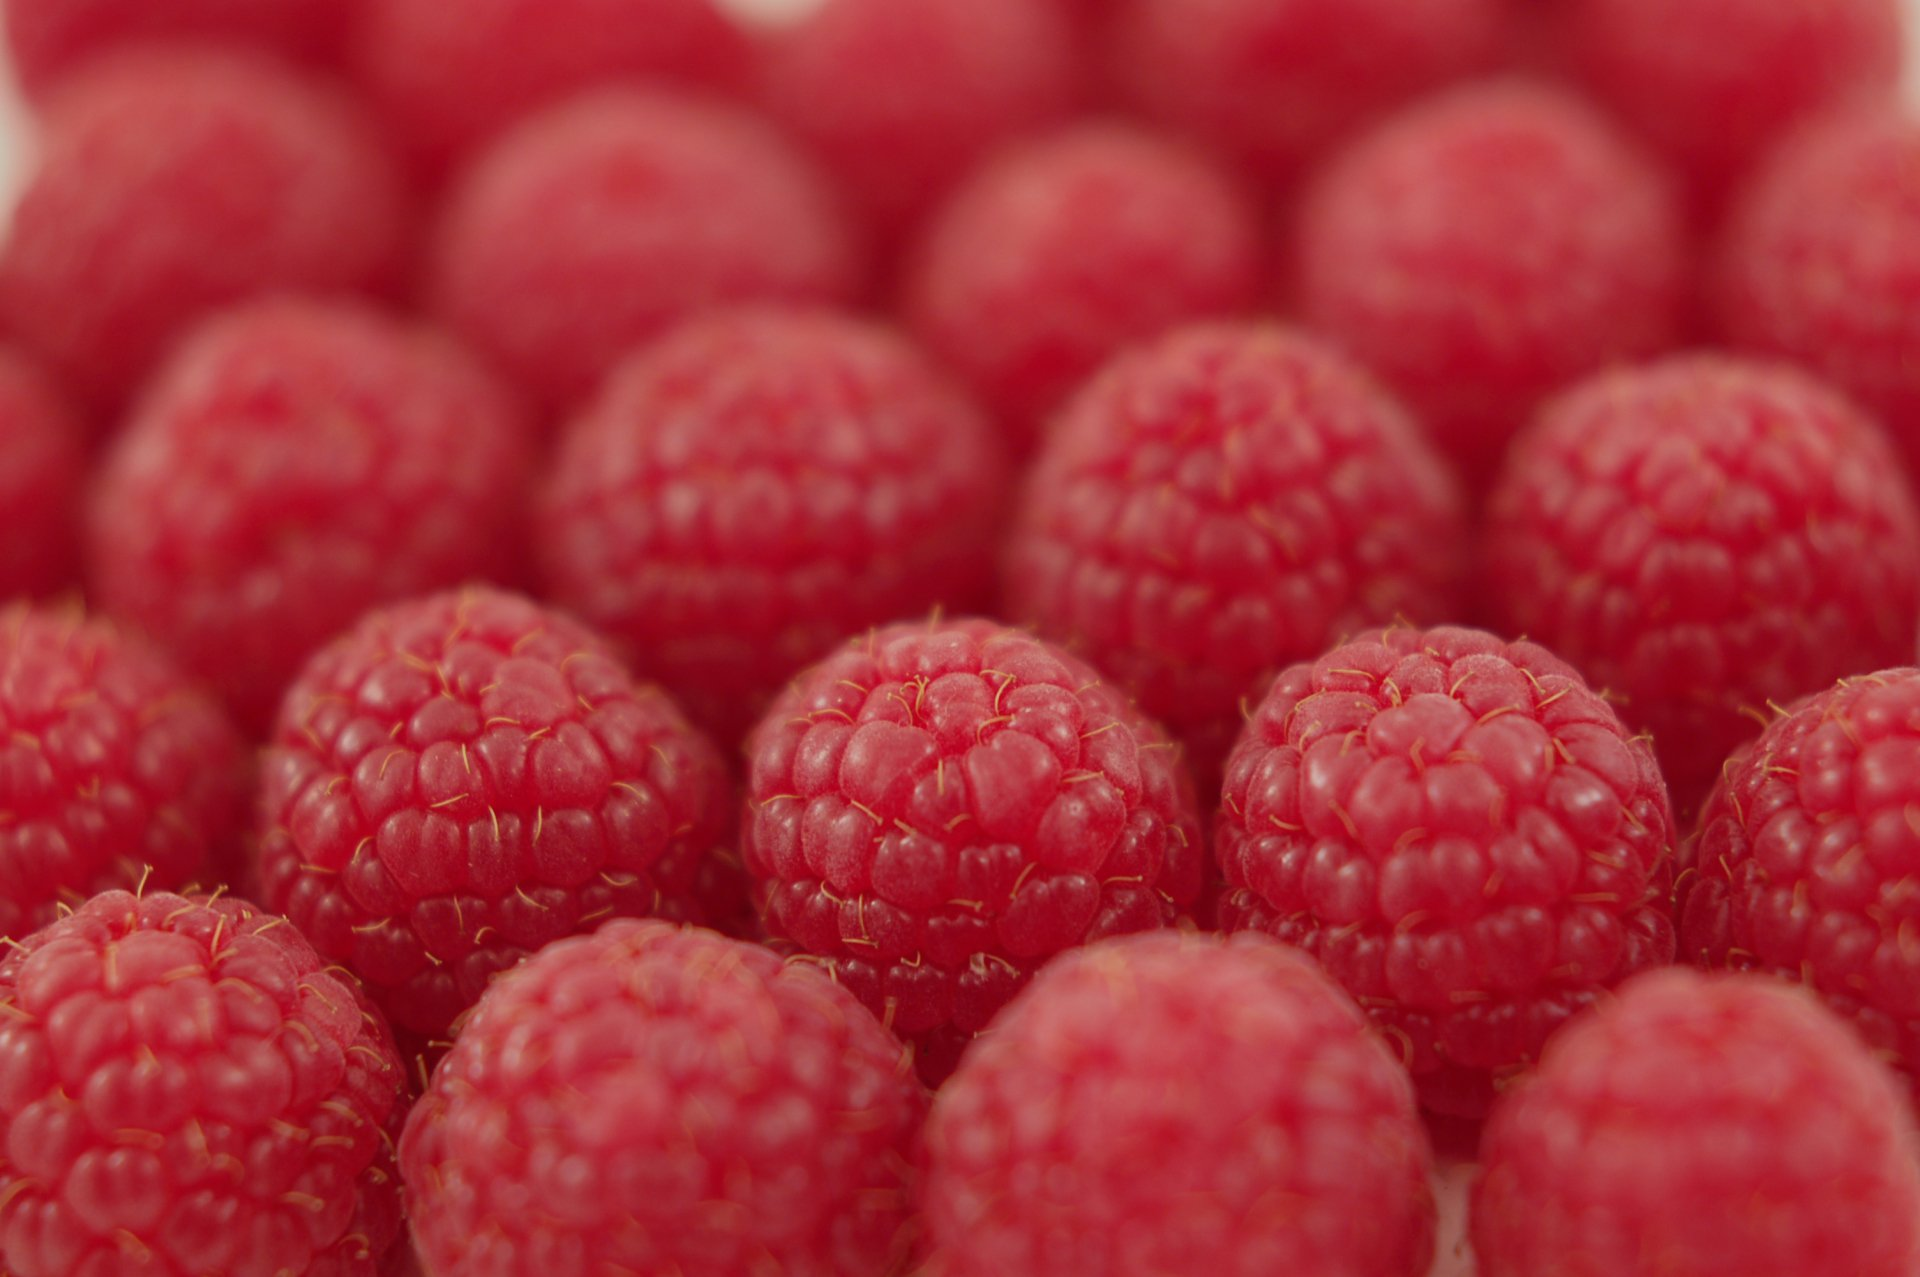 Food - Raspberry  Wallpaper